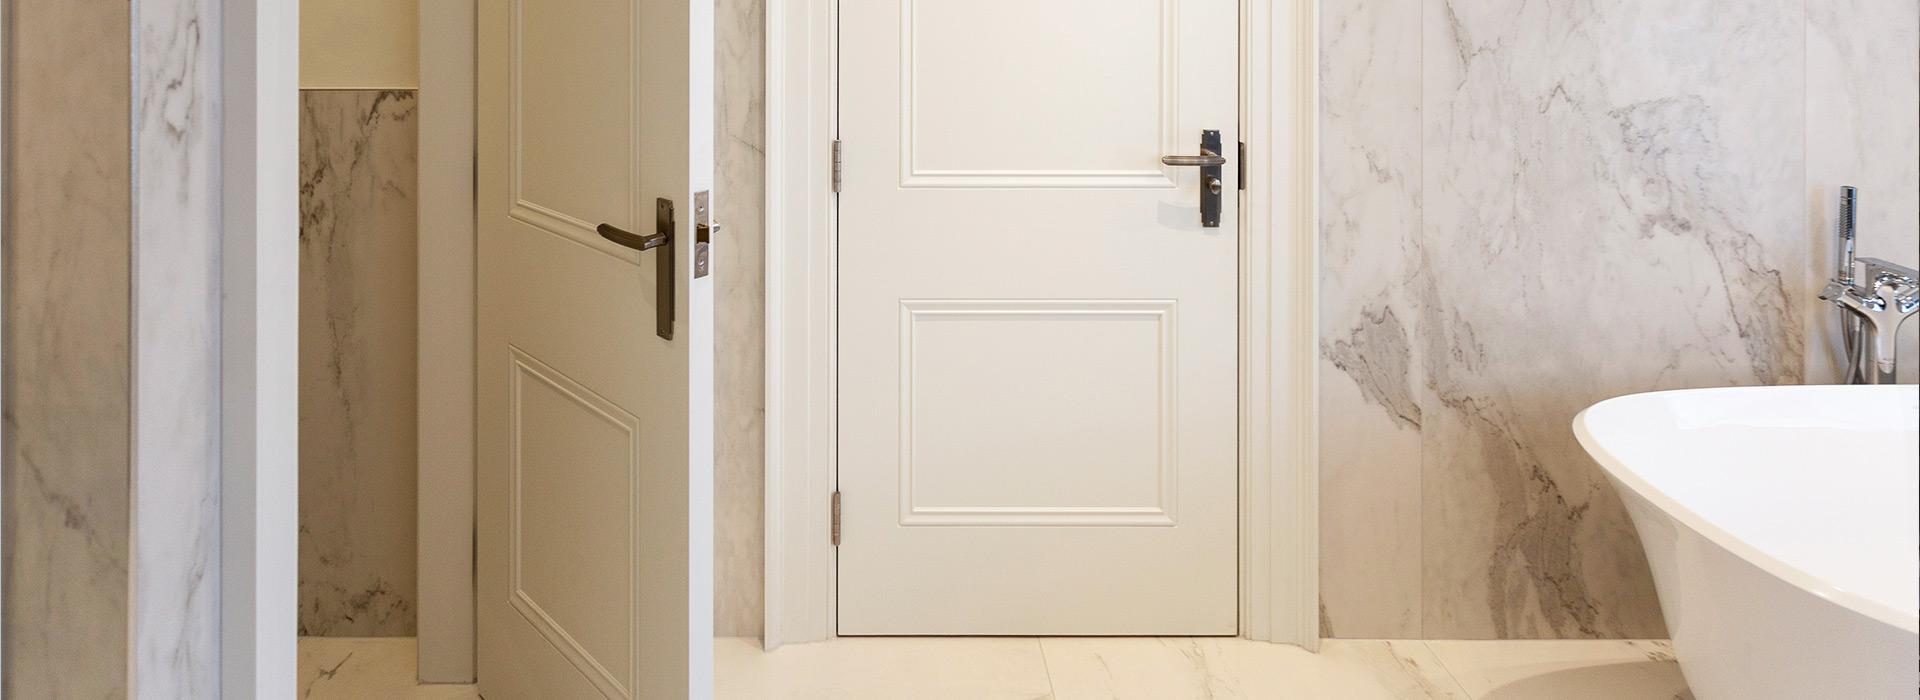 Luxury bathroom marble interior doors